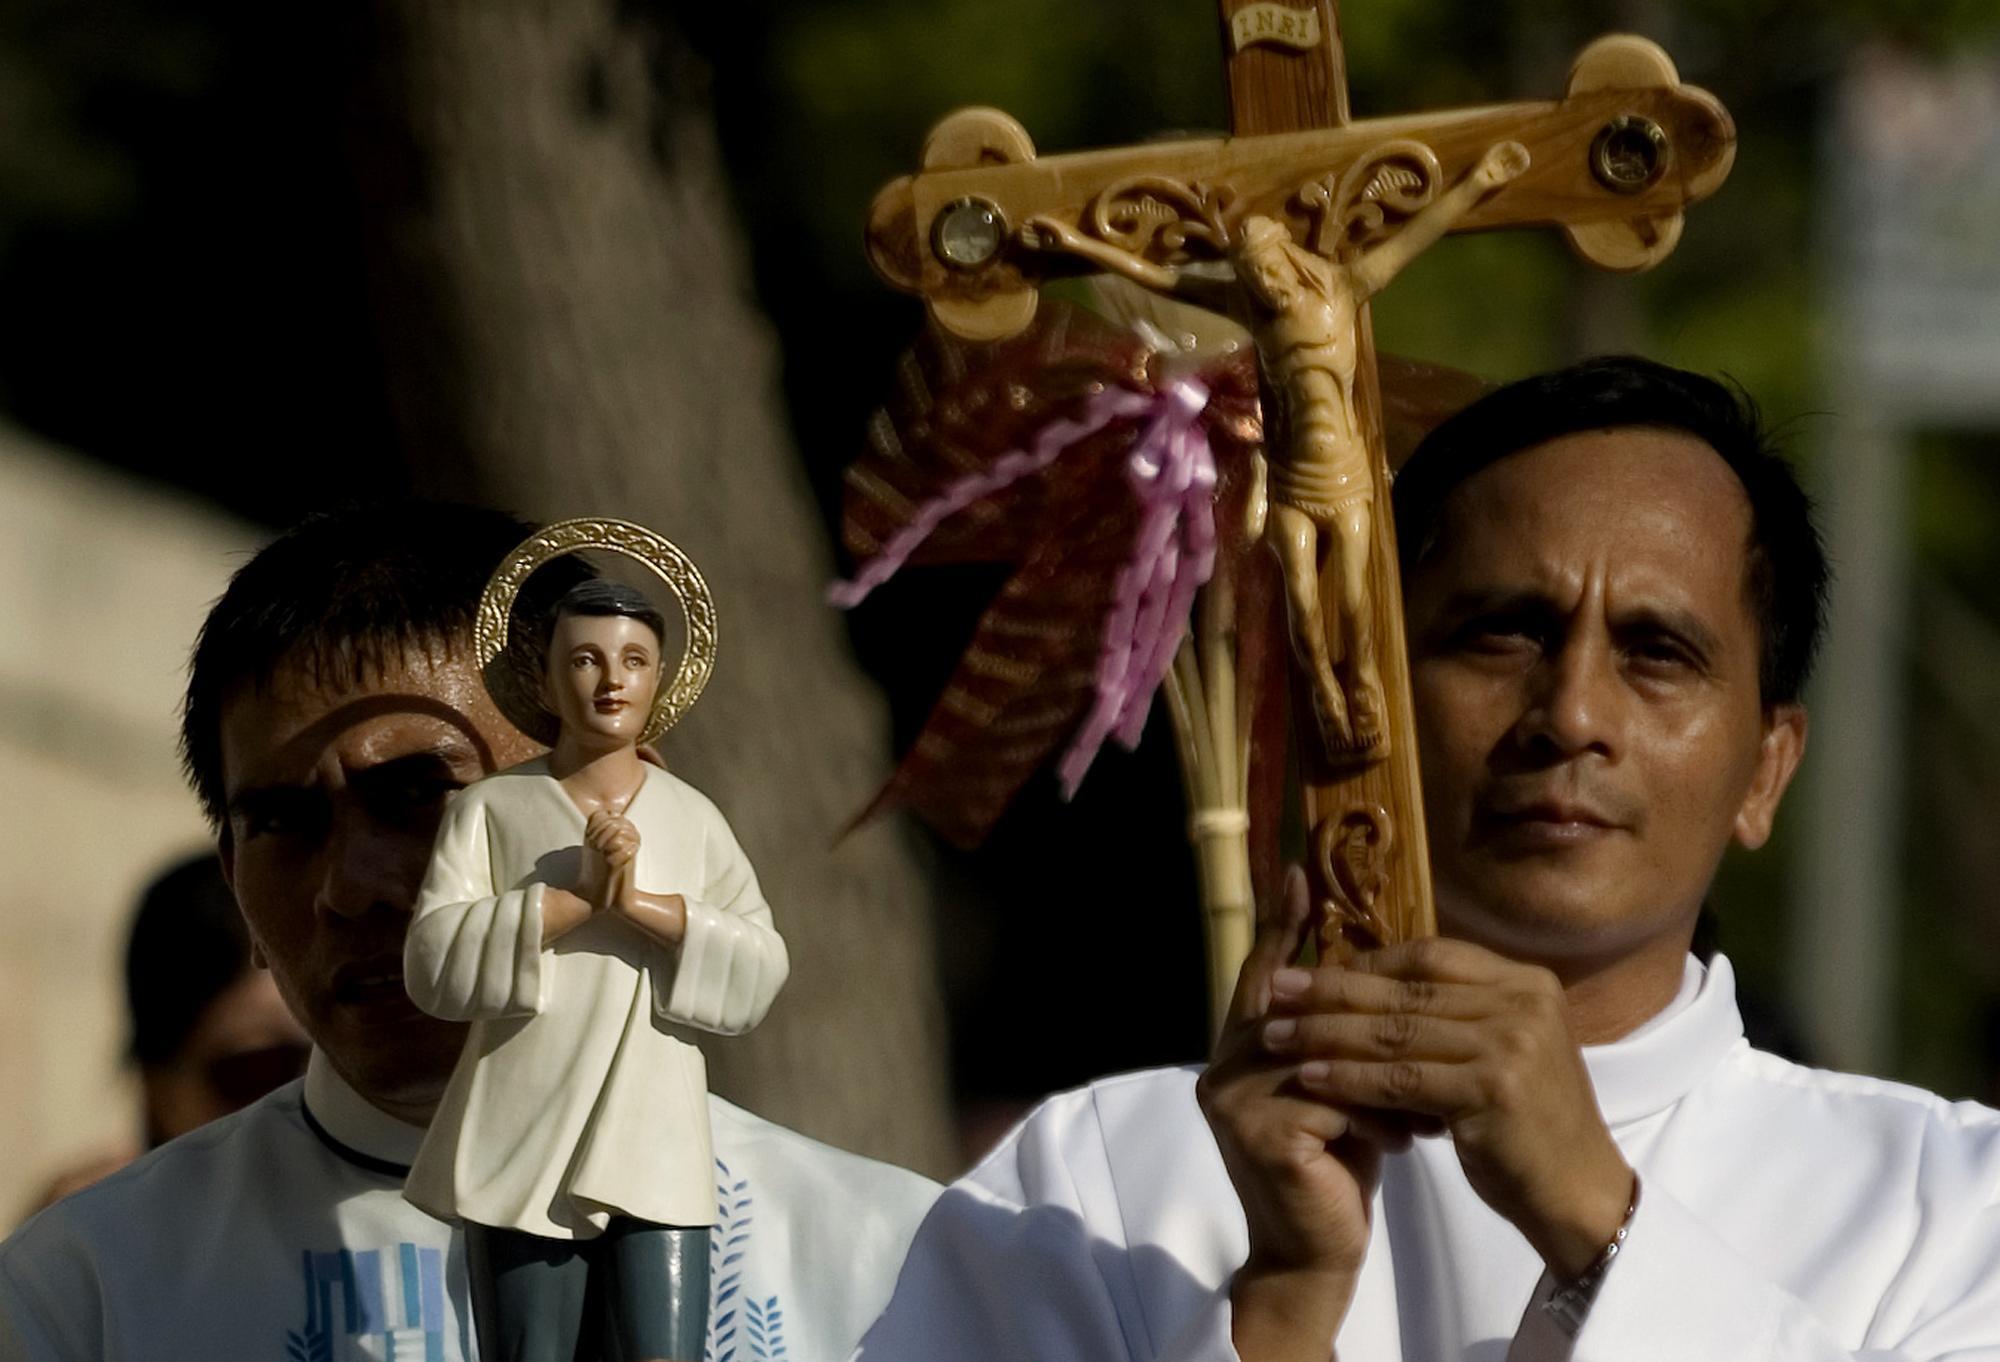 Sudan, apostasia: condanna a morte per cristiana incinta